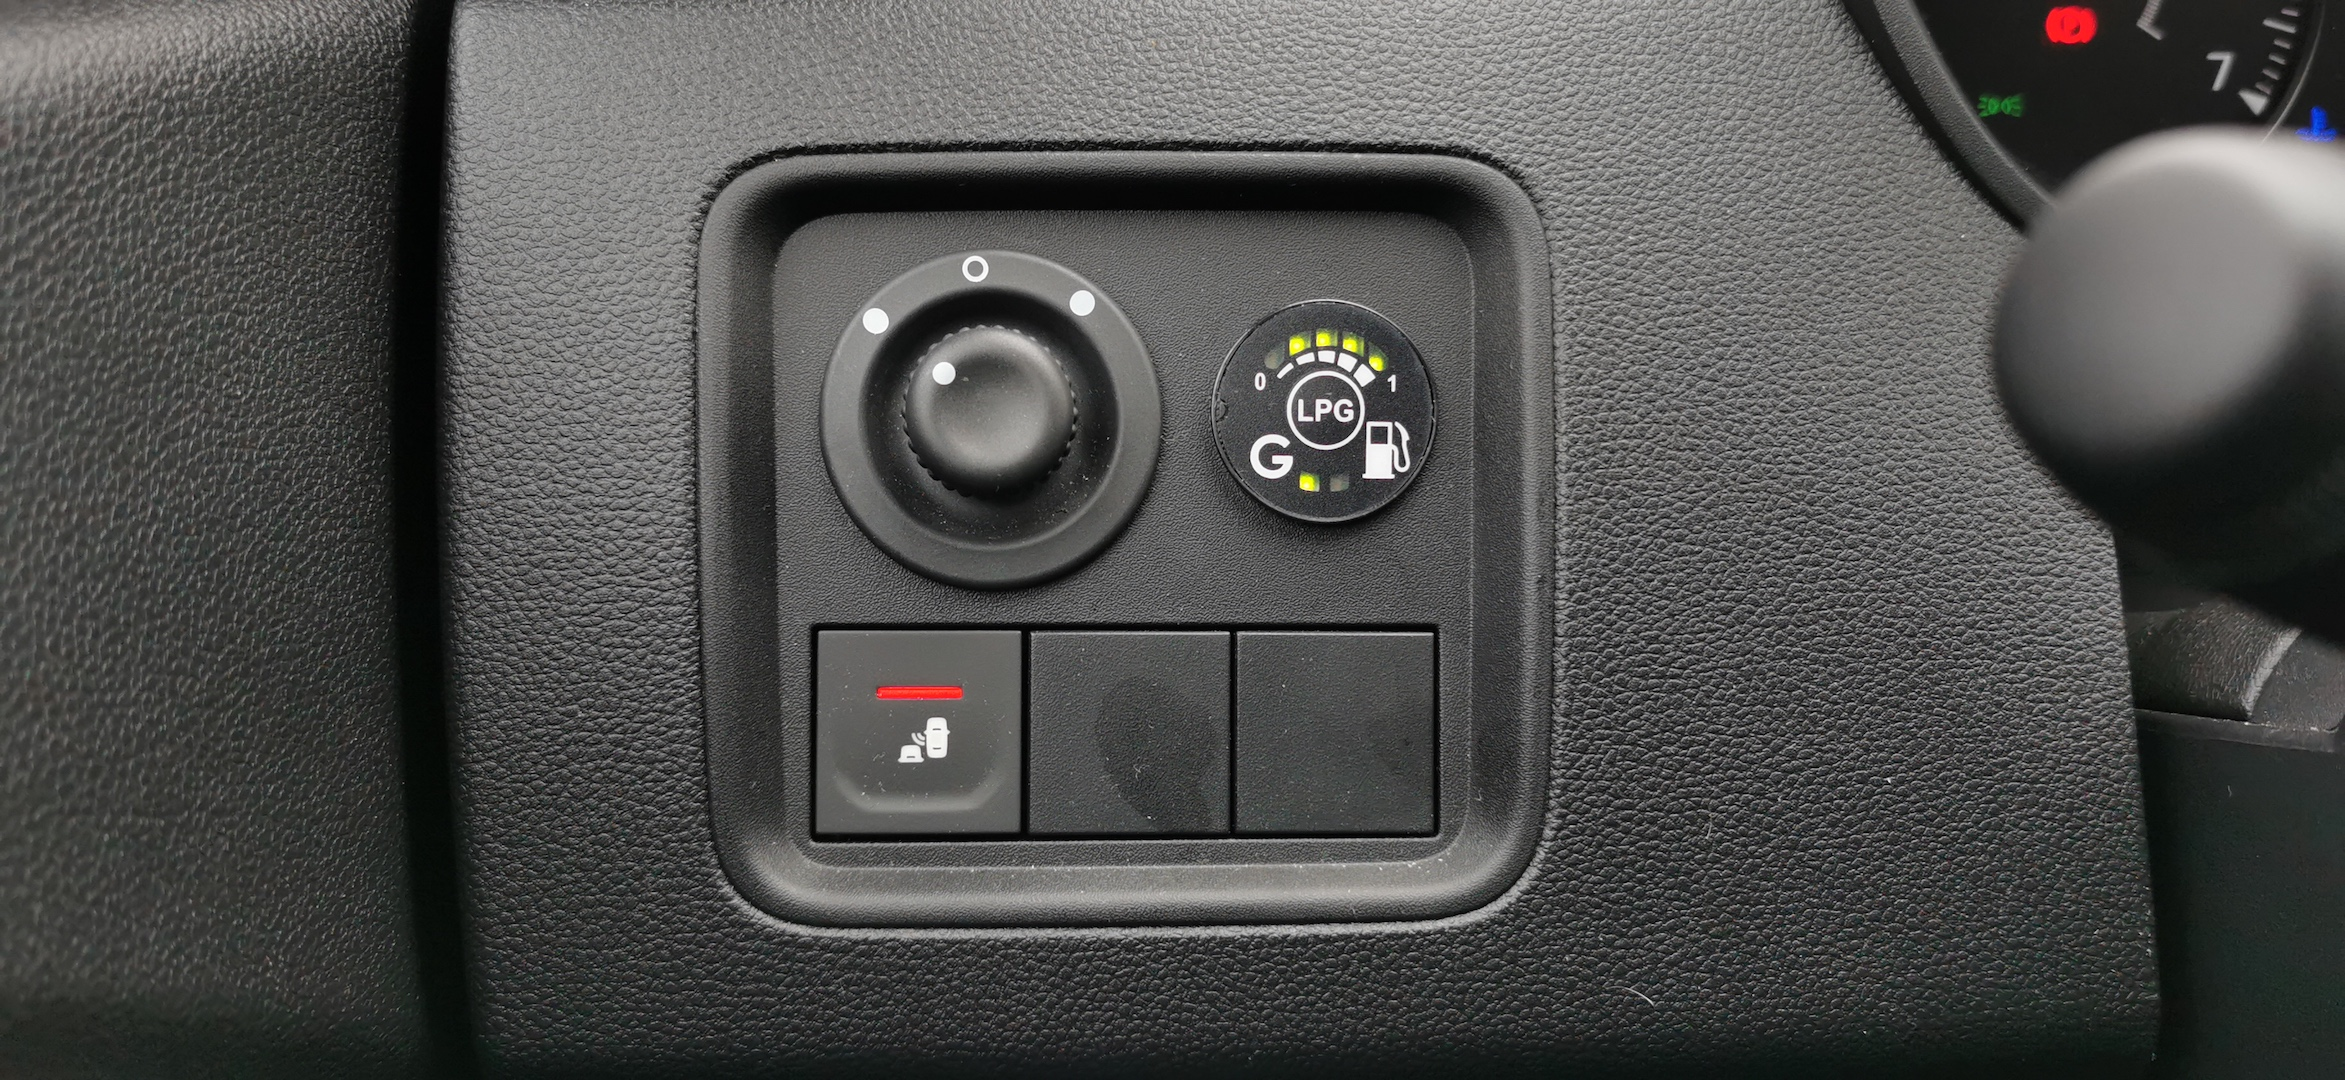 Dacia Duster TCe 100 LPG - palivoměr na LPG